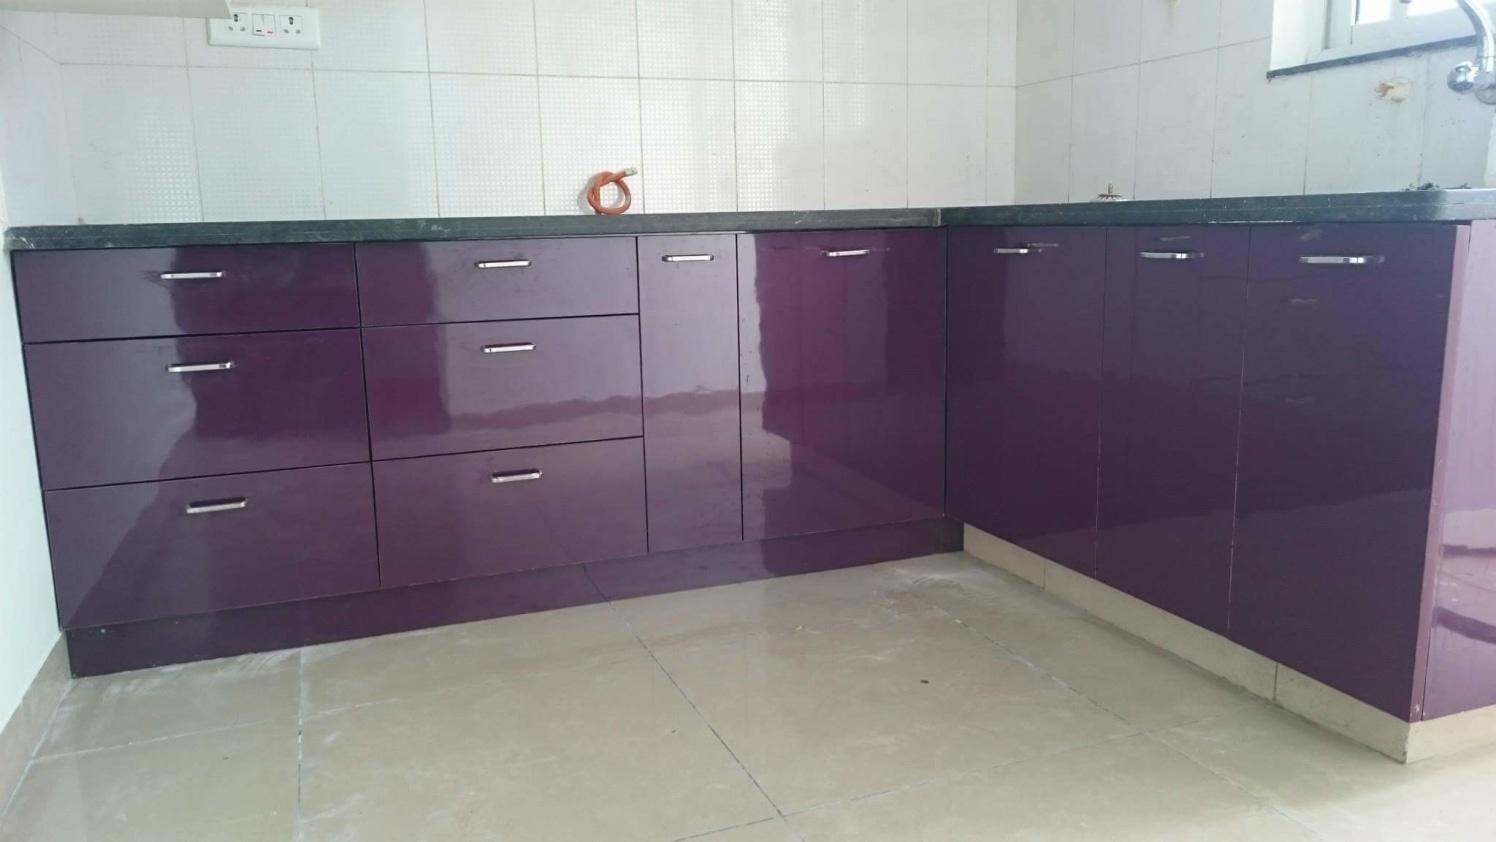 Kitchen Cabinets by 12 Square Interiors  Modular-kitchen | Interior Design Photos & Ideas